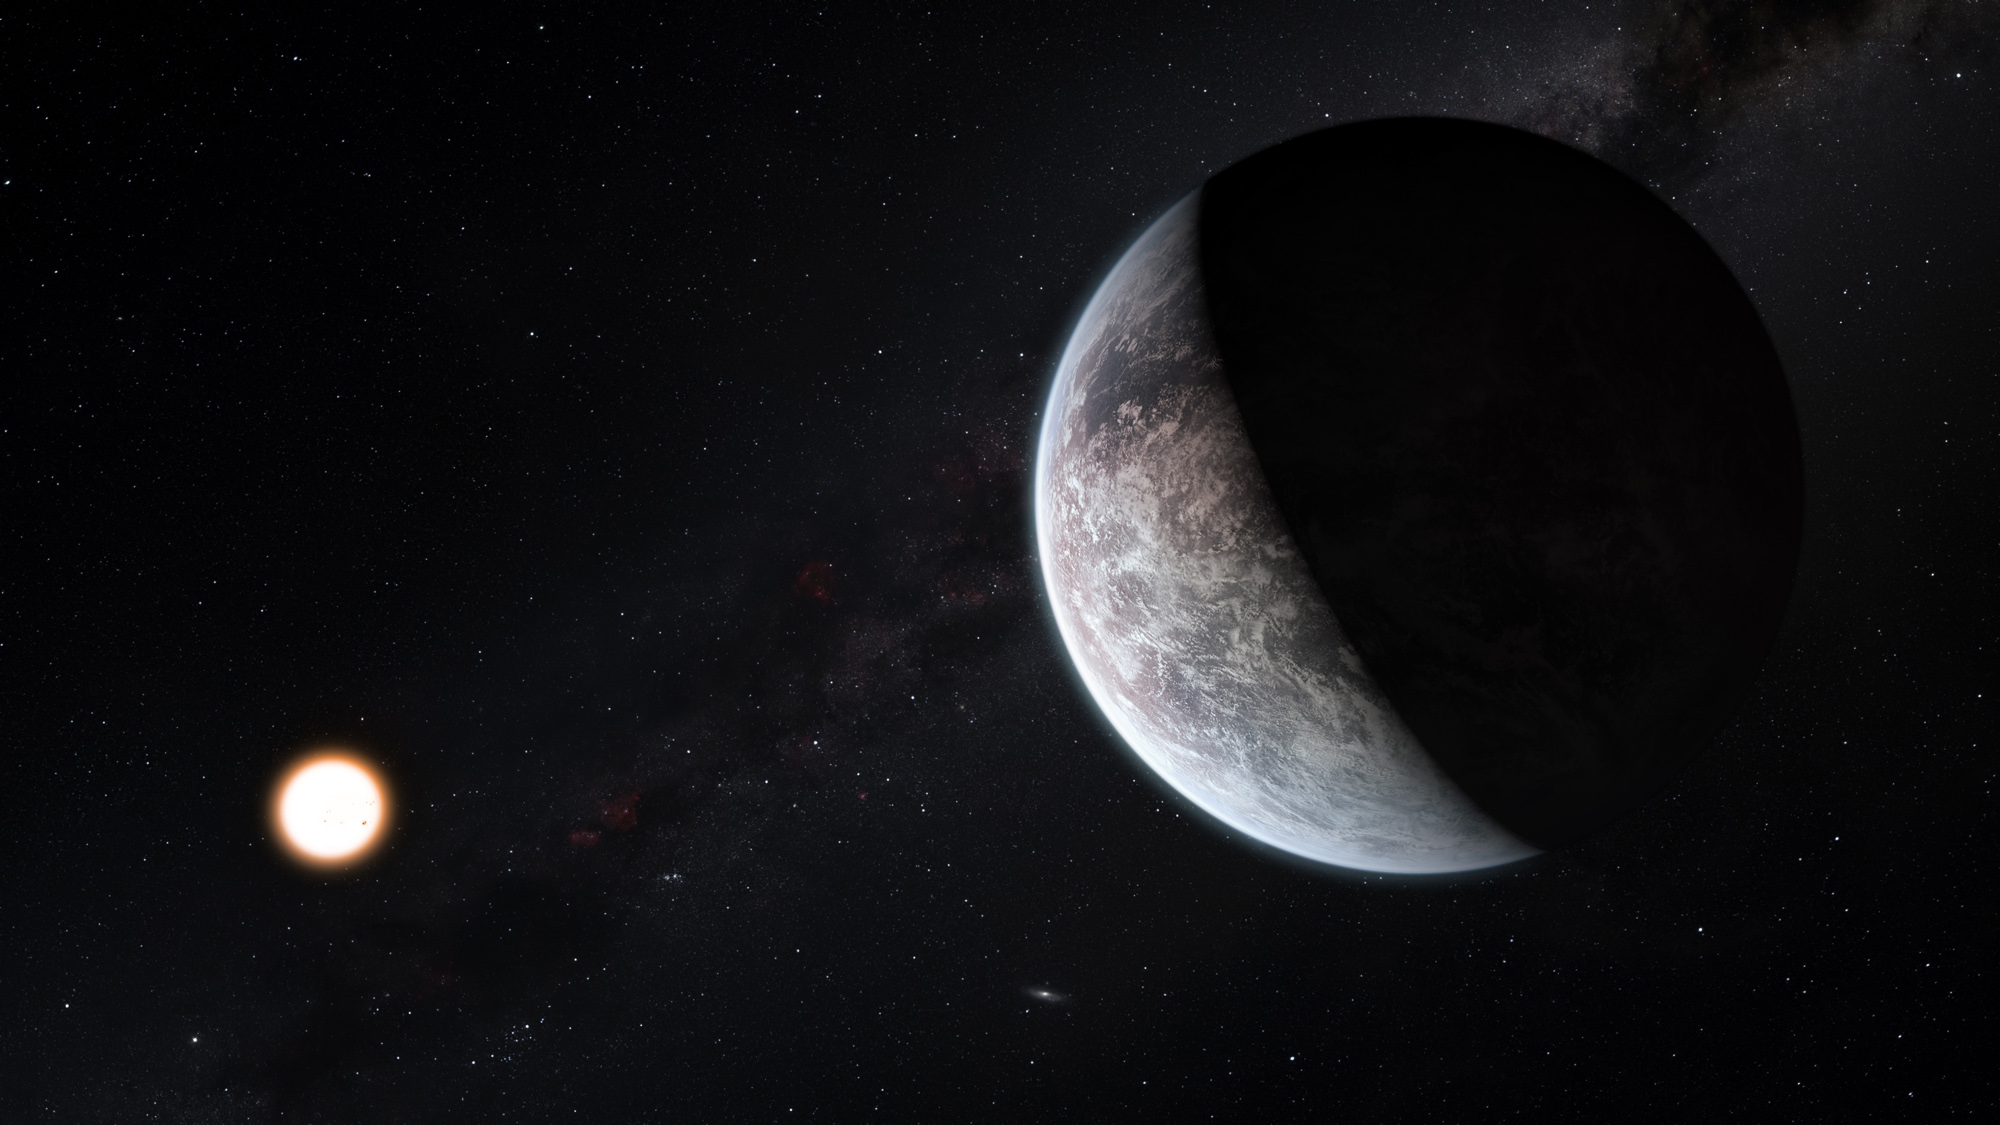 super-earth planet - photo #12